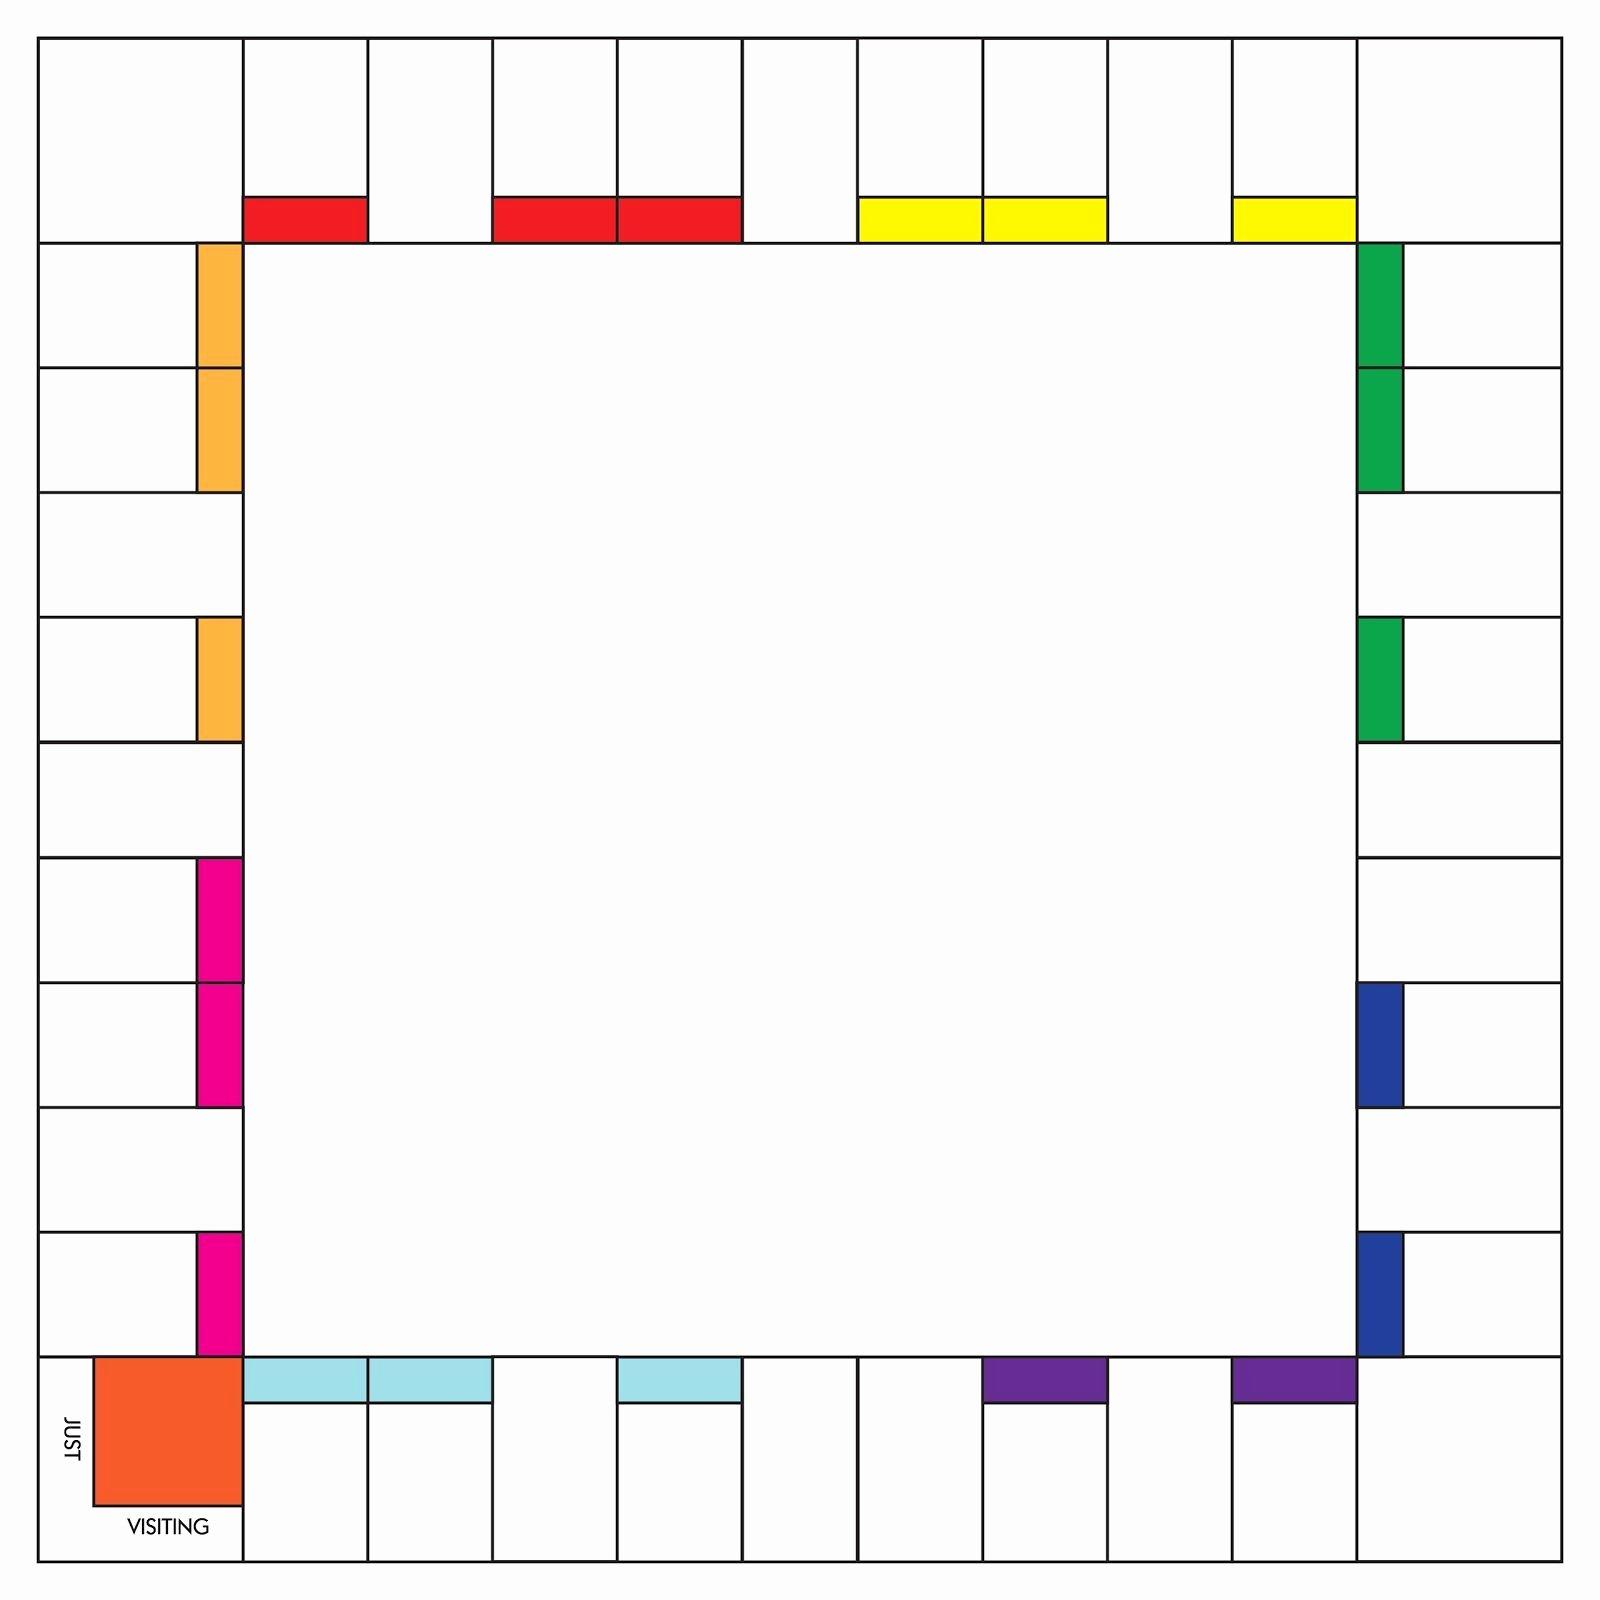 Monopoly Board Template Beautiful Blank Monopoly Board Template Monopoly